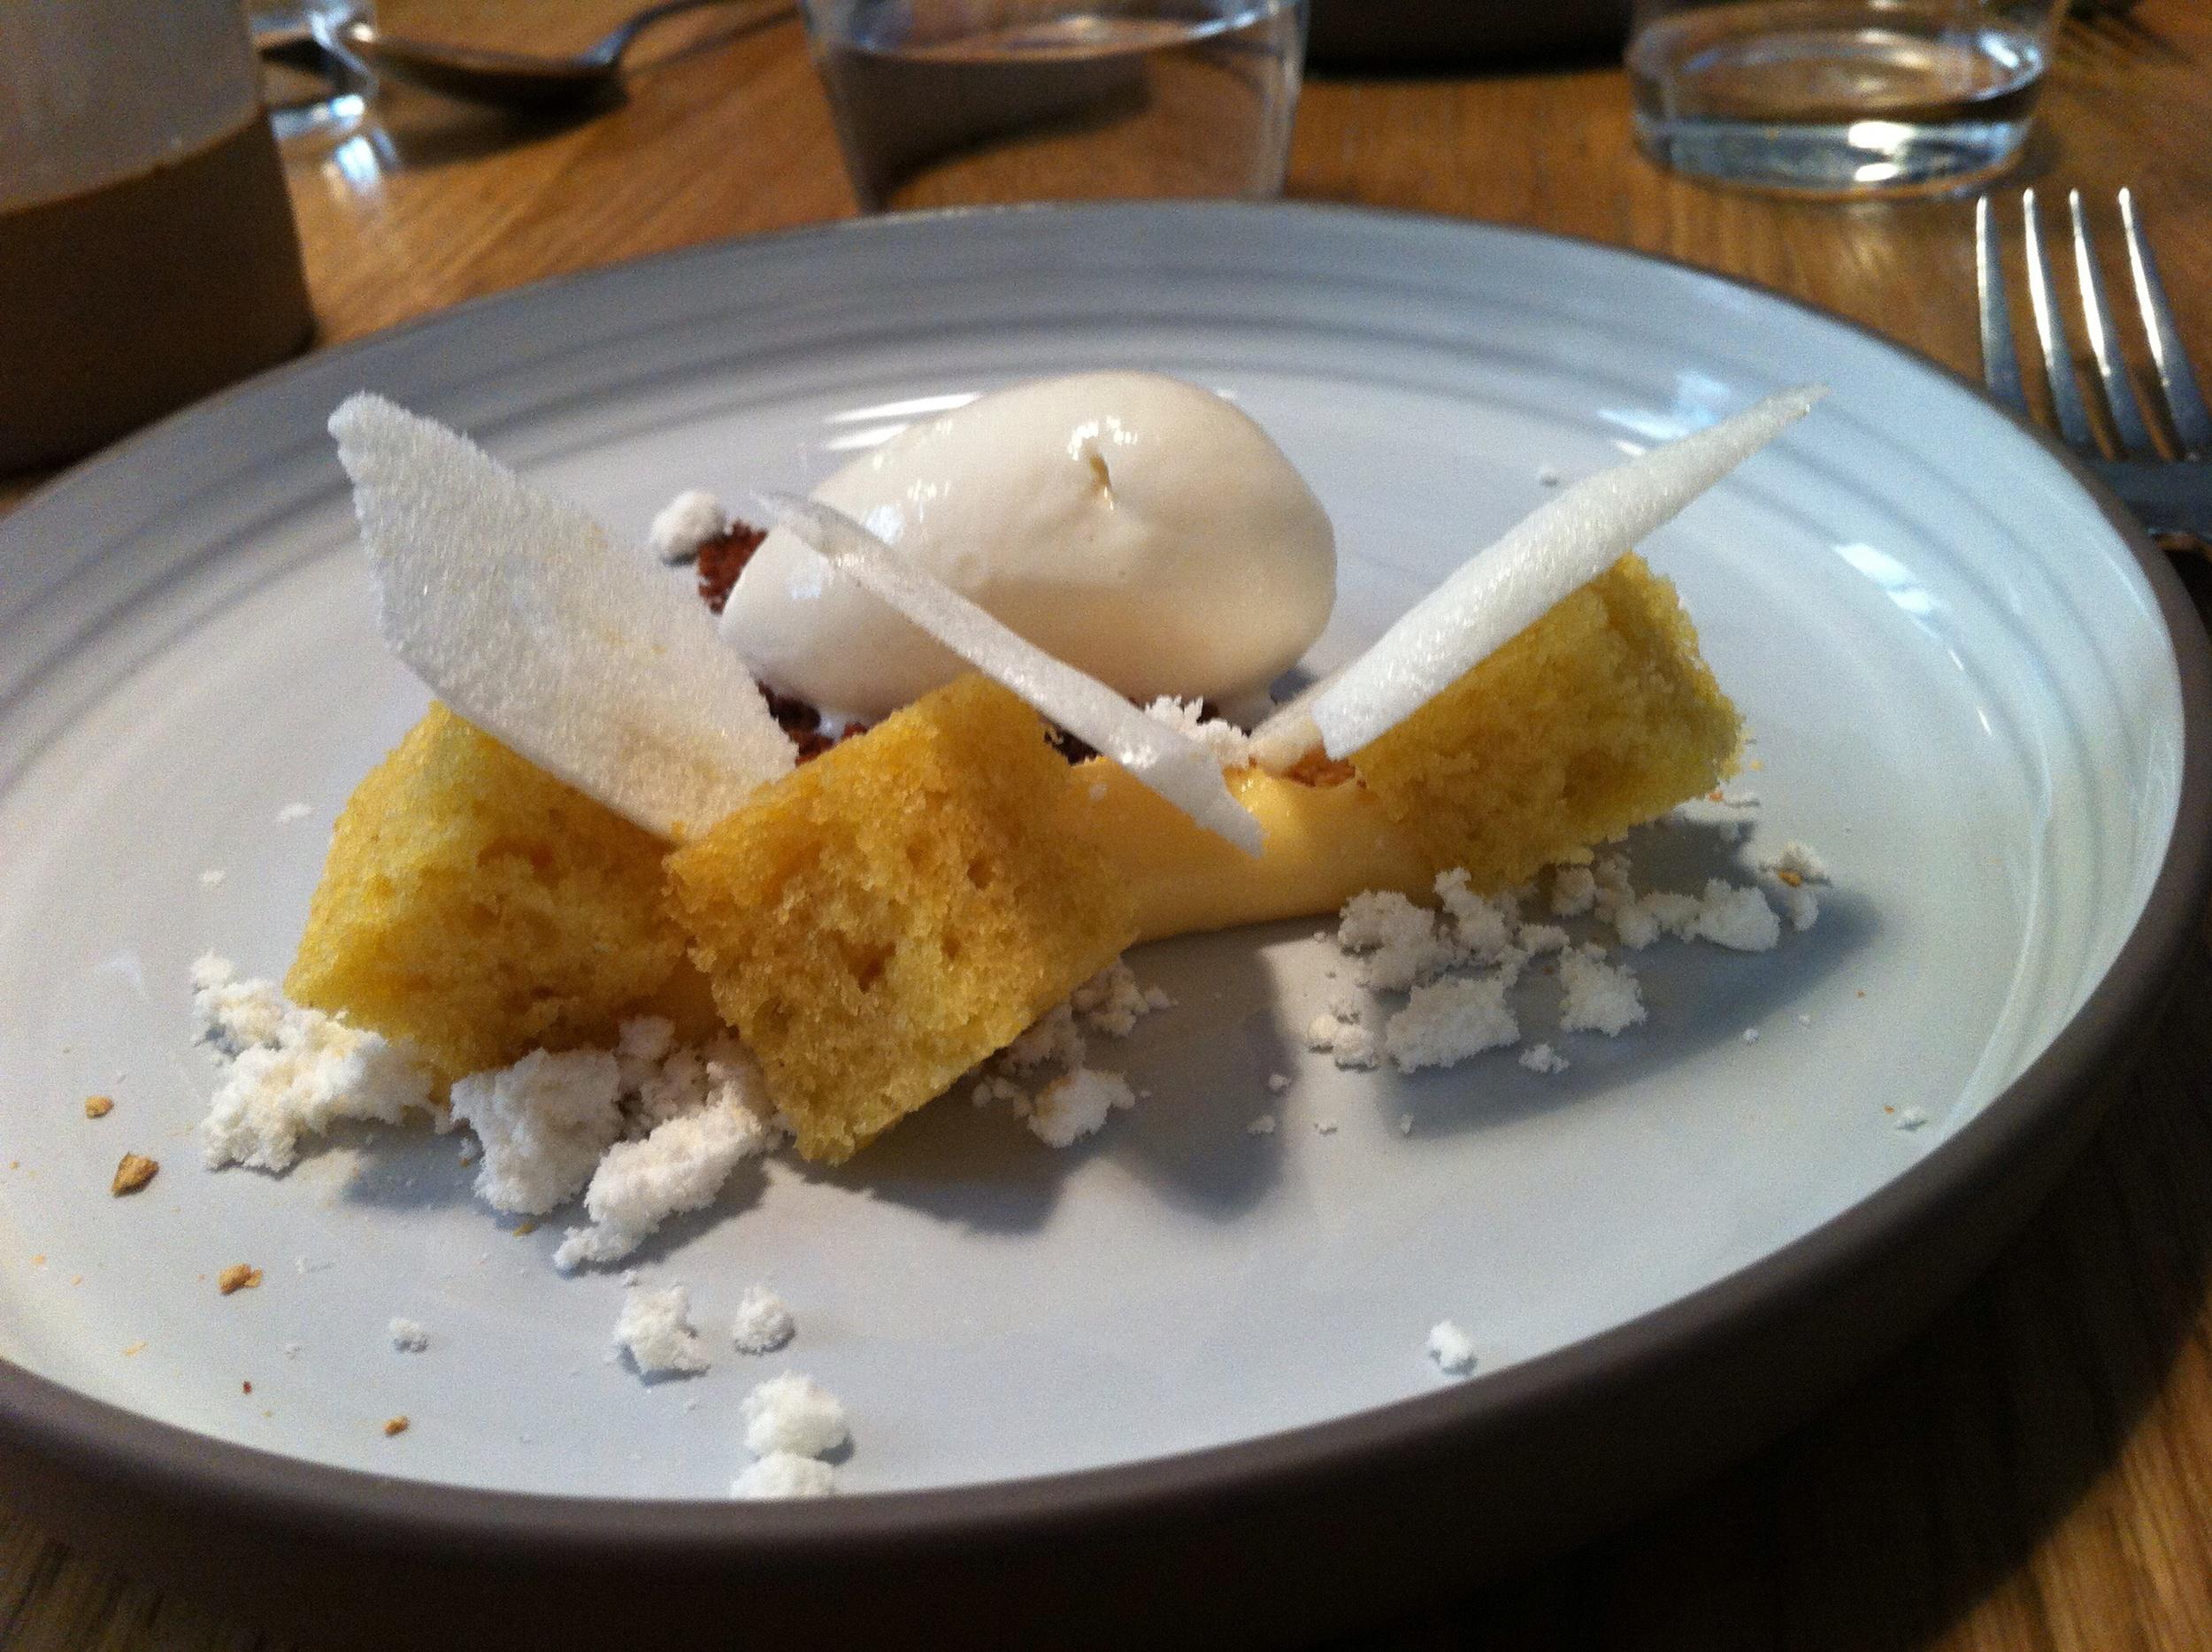 Lemon cake, cream and sorbet with meringue